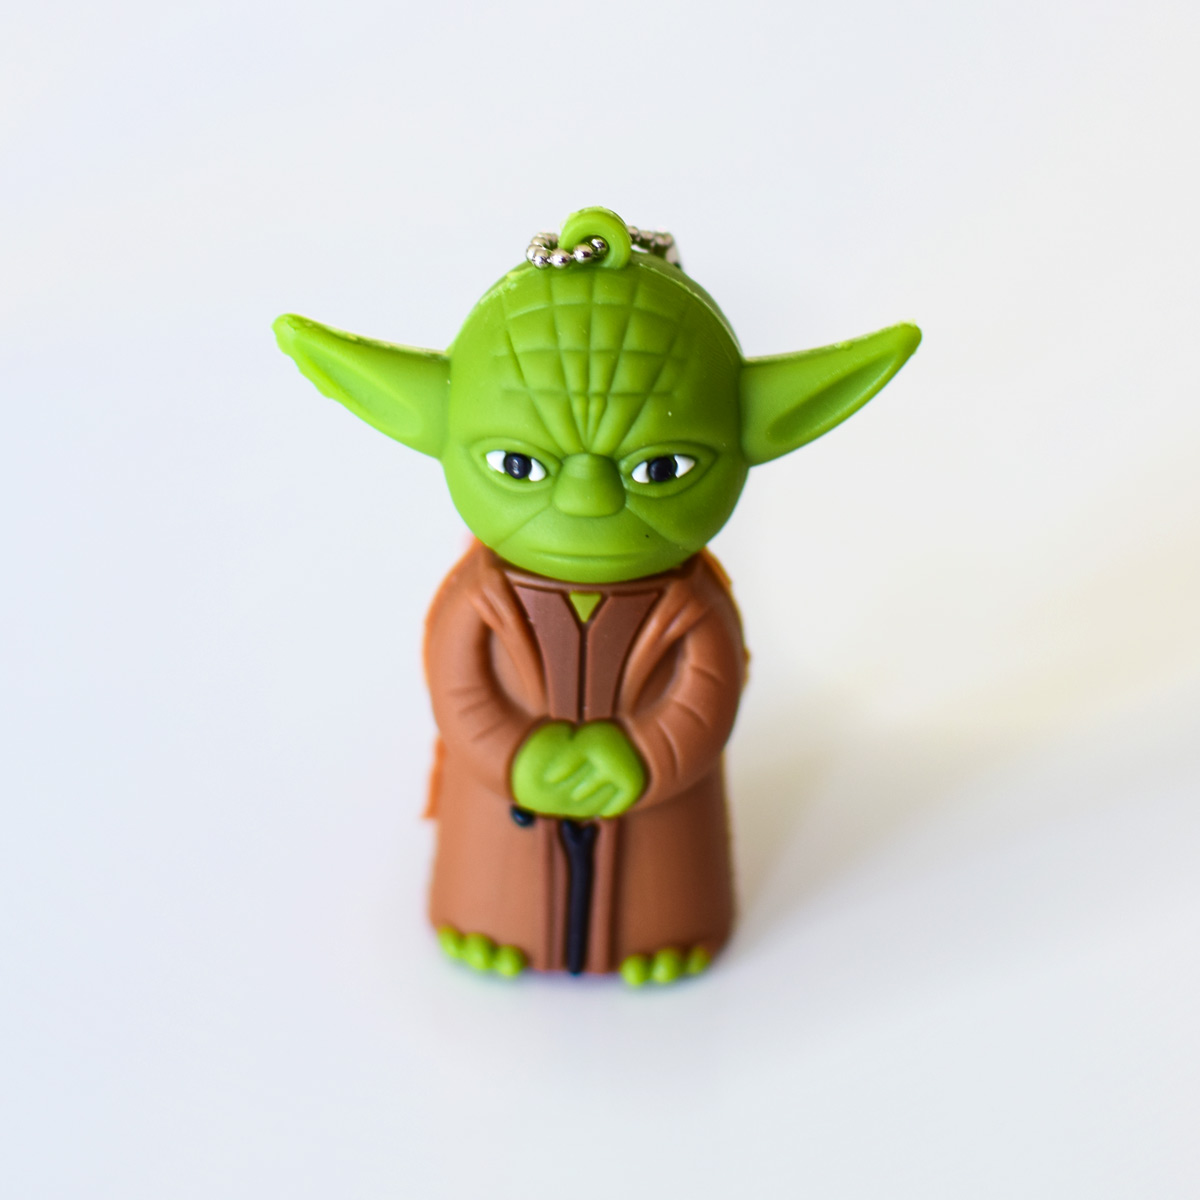 Majster Yoda - USB kľúč